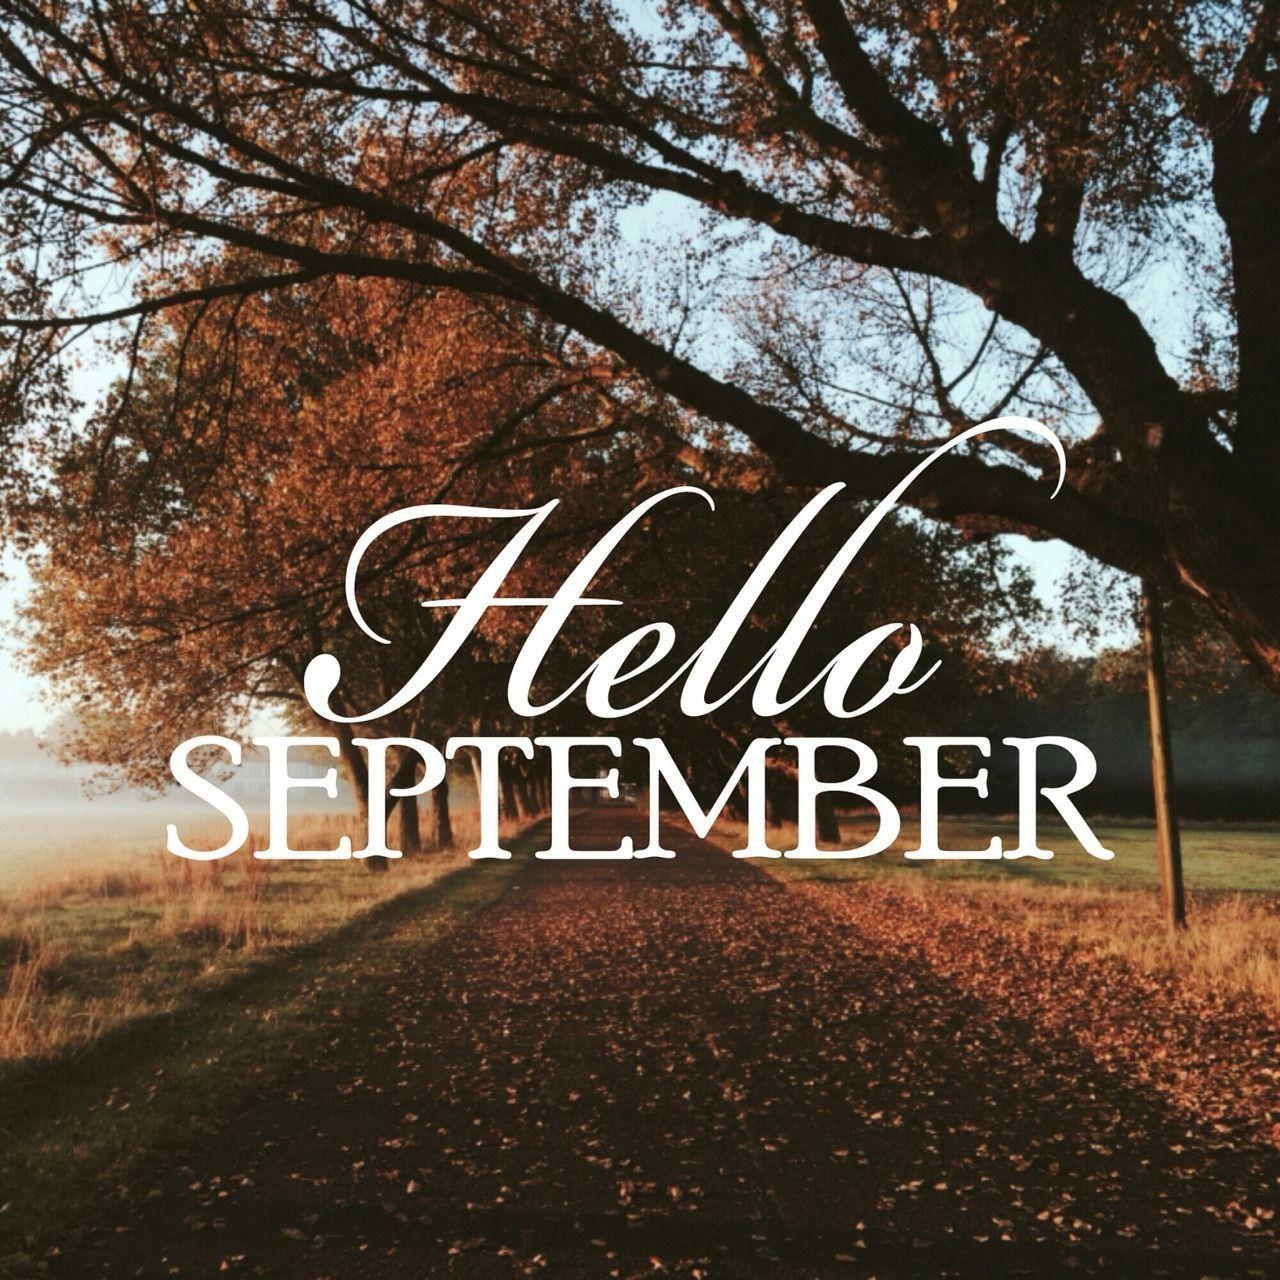 Hello September #helloseptember Hello September #helloseptember Hello September #helloseptember Hello September #helloseptember Hello September #helloseptember Hello September #helloseptember Hello September #helloseptember Hello September #helloseptember